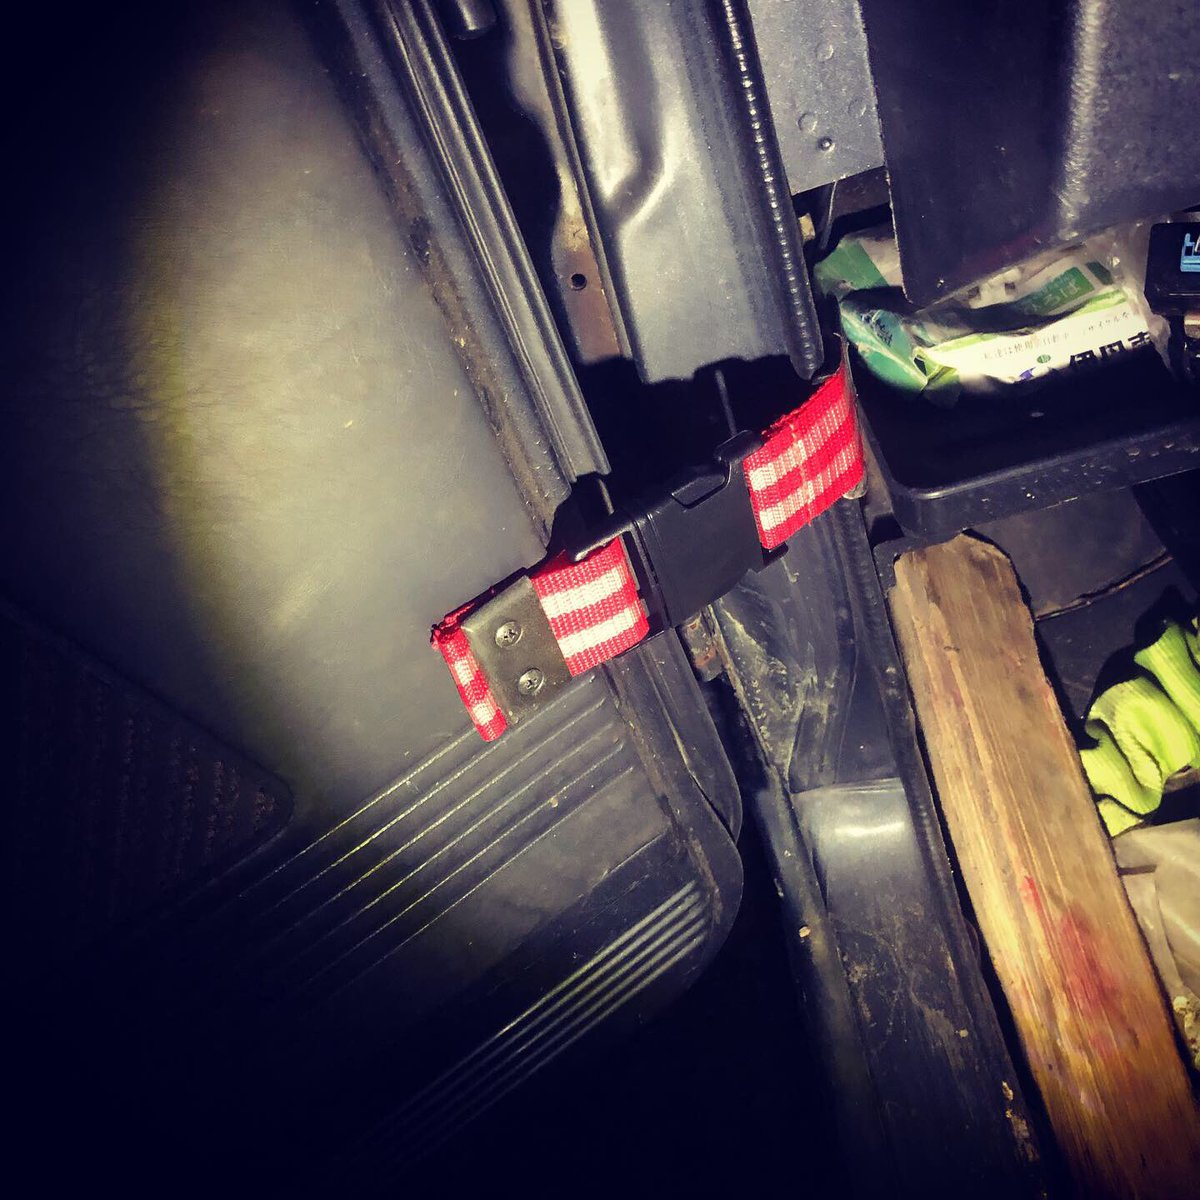 test ツイッターメディア - ジムニー用クイックリリースドアストッパー装着。 耐久性は要検証ということで。  #ジムニー #jimny #DIYパーツ #ダイソー https://t.co/SMP2CFDFlt